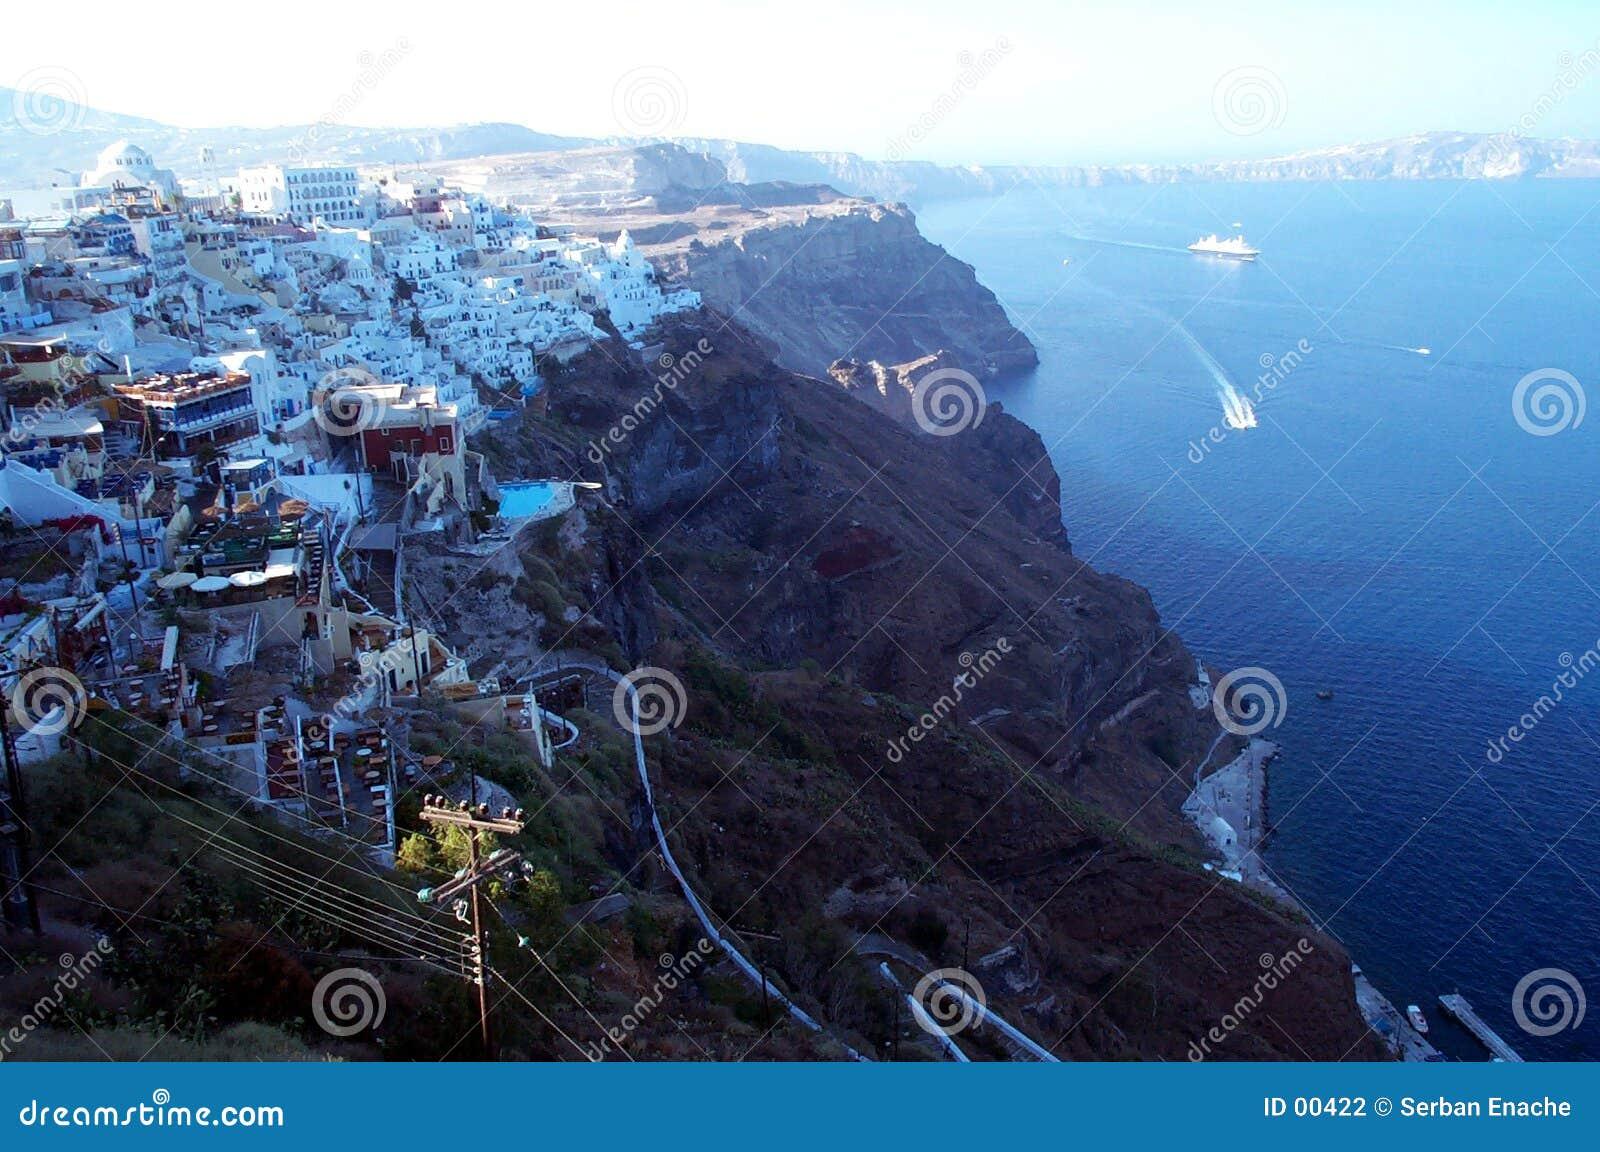 Caldera view - the cliff